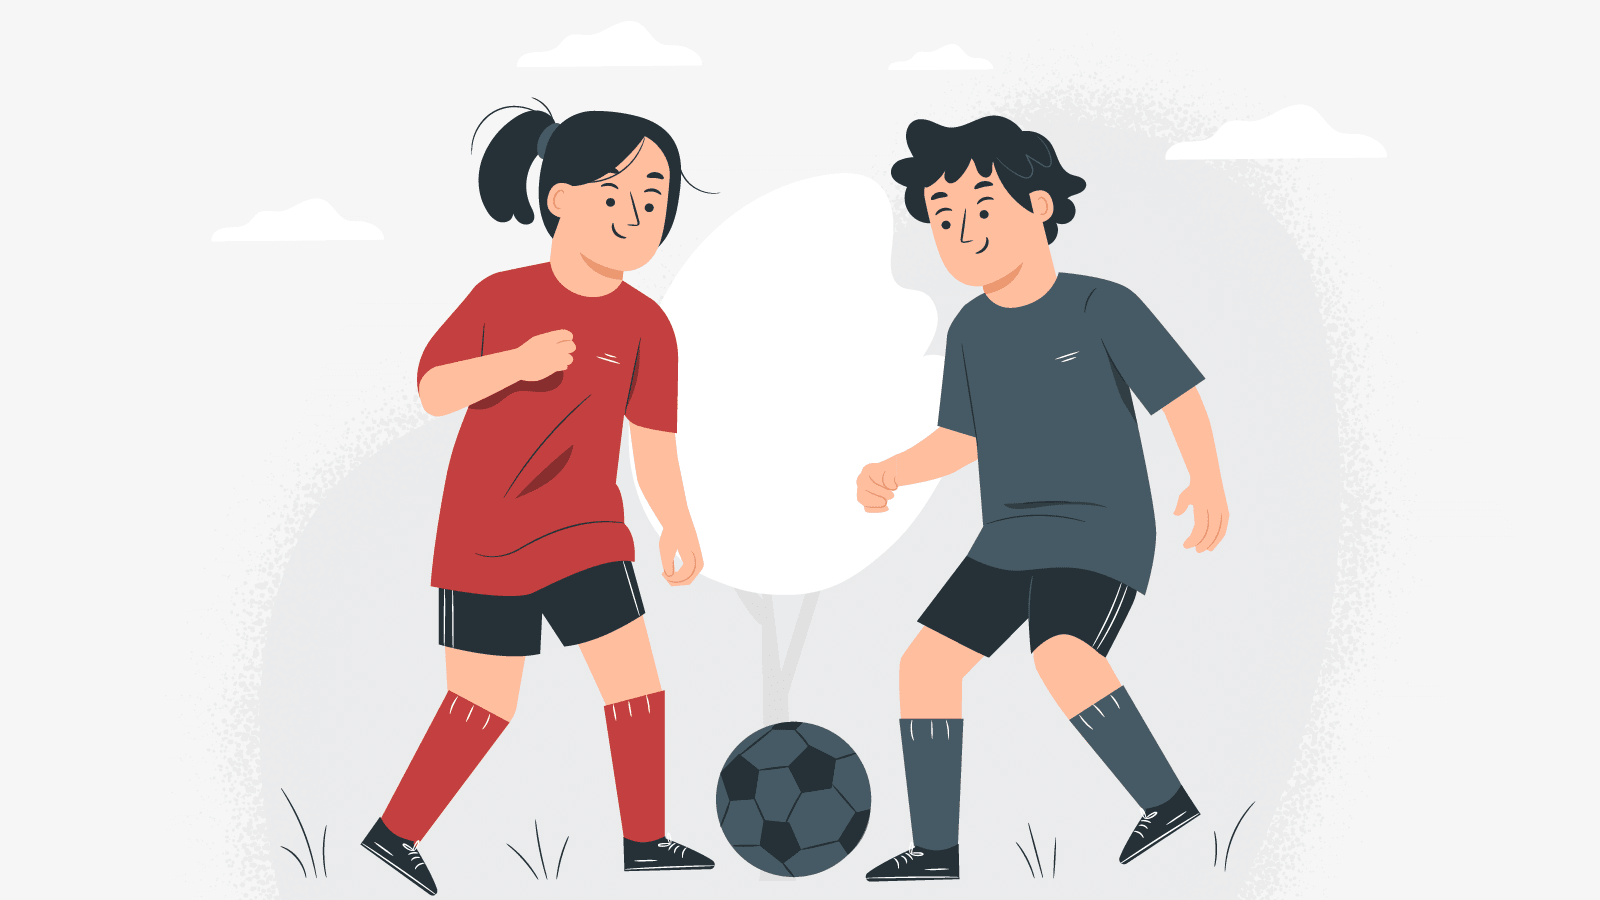 Encourage hobbies and extracurricular activities